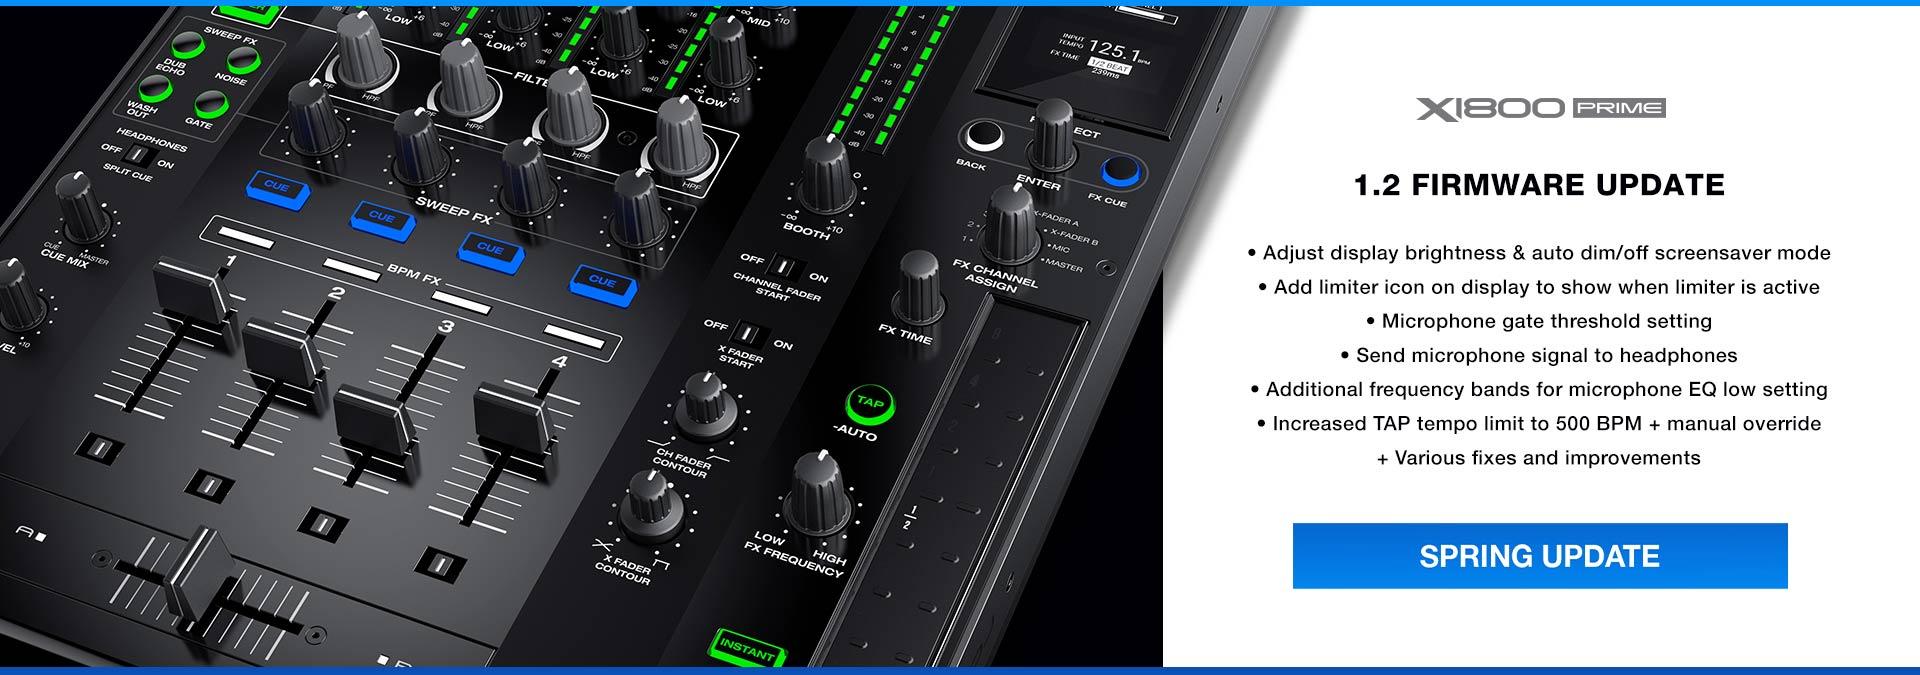 DENON DJ-X1800 DJ MIXER